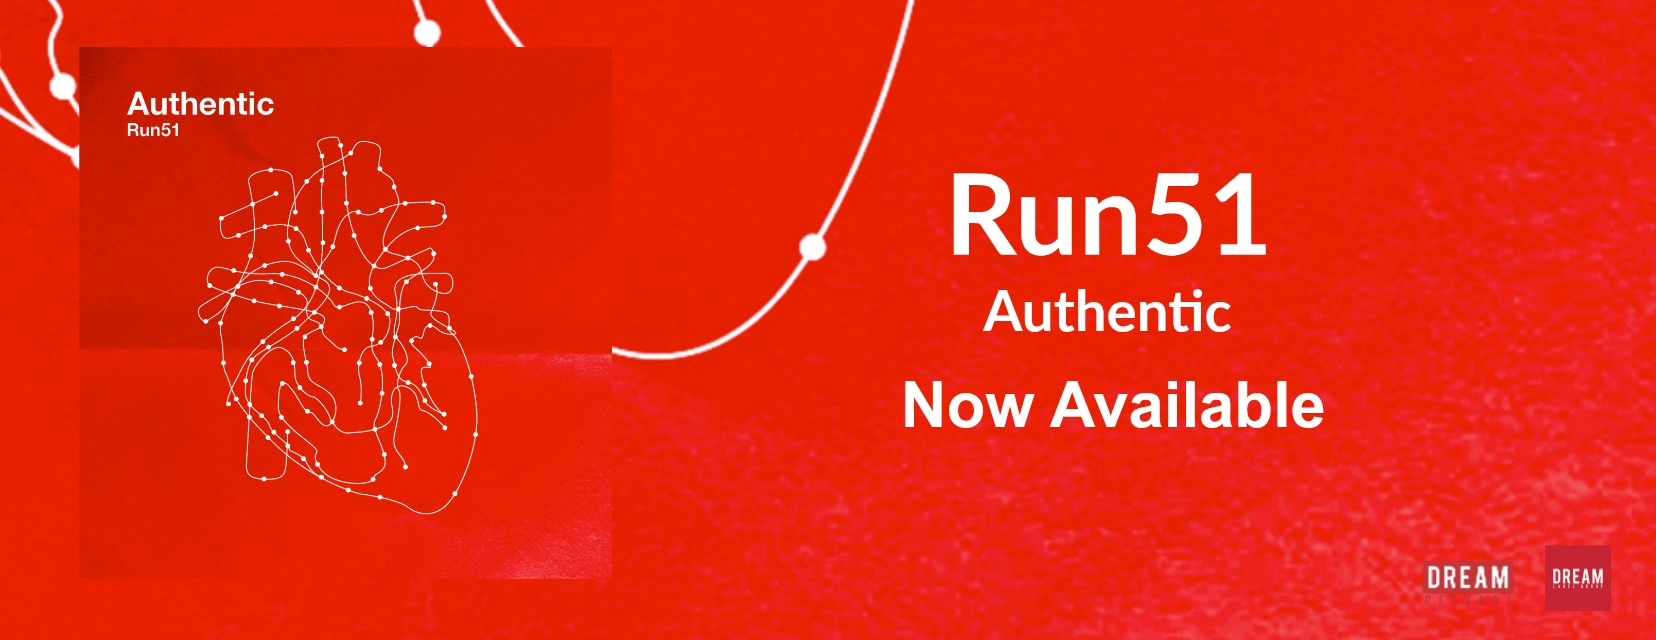 Run51 Drops New Single 'Authentic'